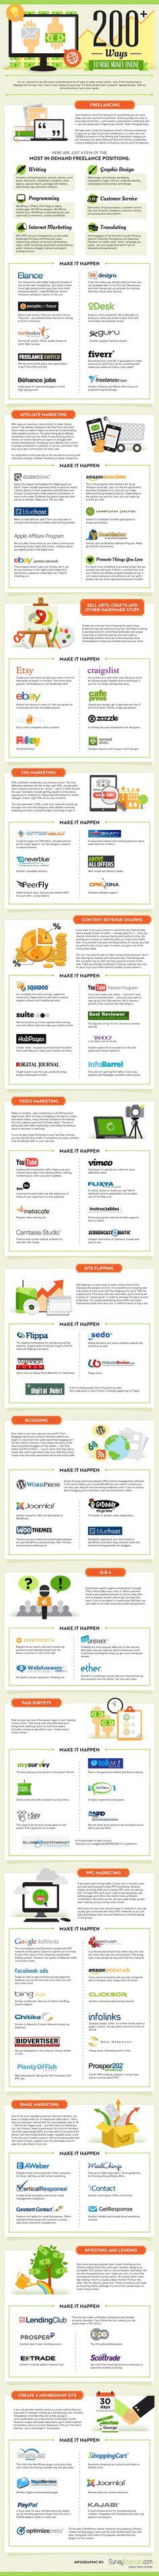 companies offering legitimate work at home jobs job seekers make money online infographic 200 ways